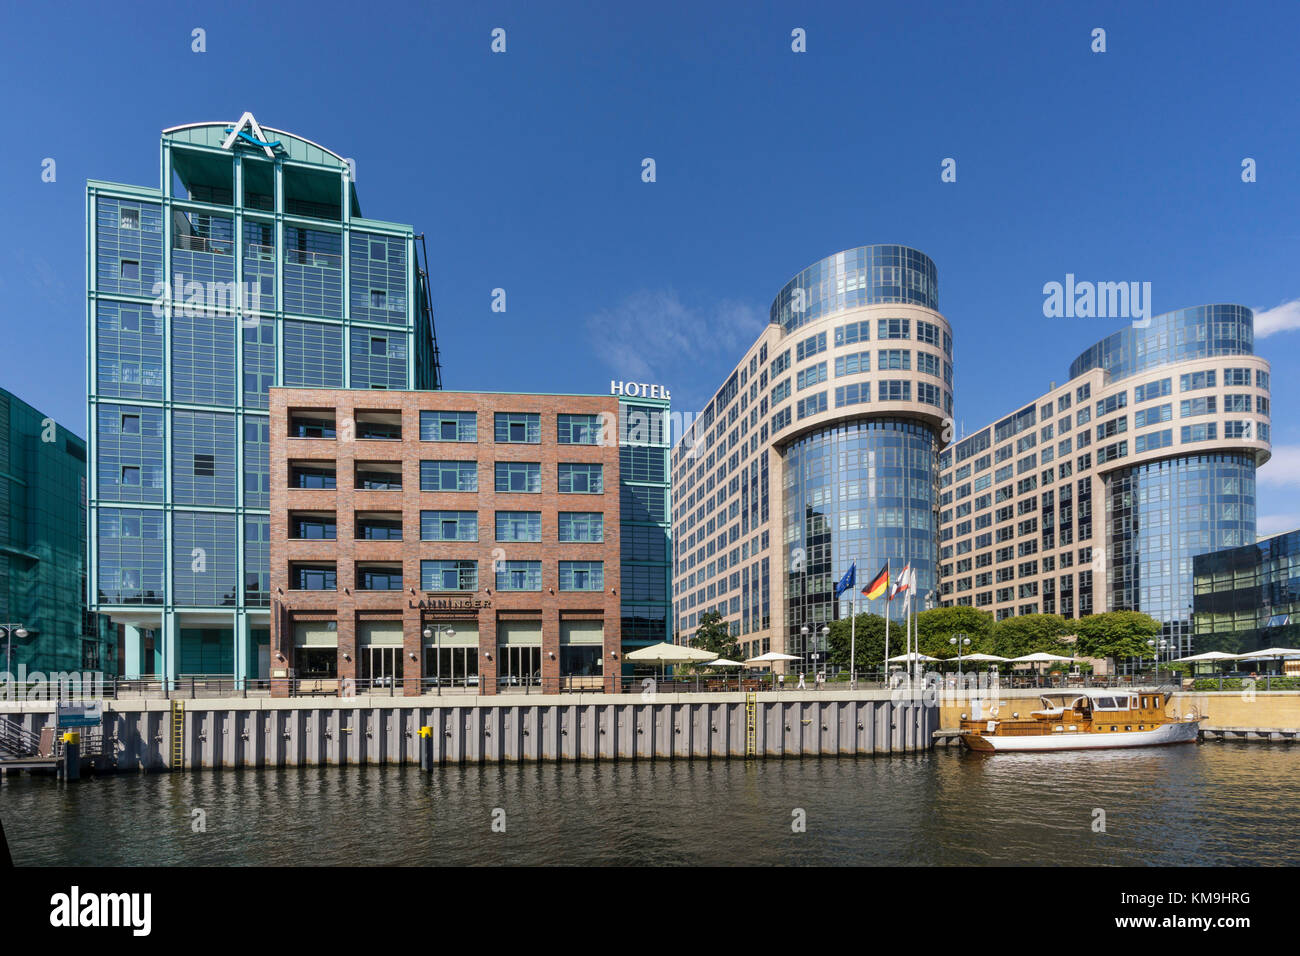 Spreebogen, moderne Architektur, Spree, Alt Moabit, Hotel abion, alte bolle Molkerei,, Berlin, Deutschland Stockbild